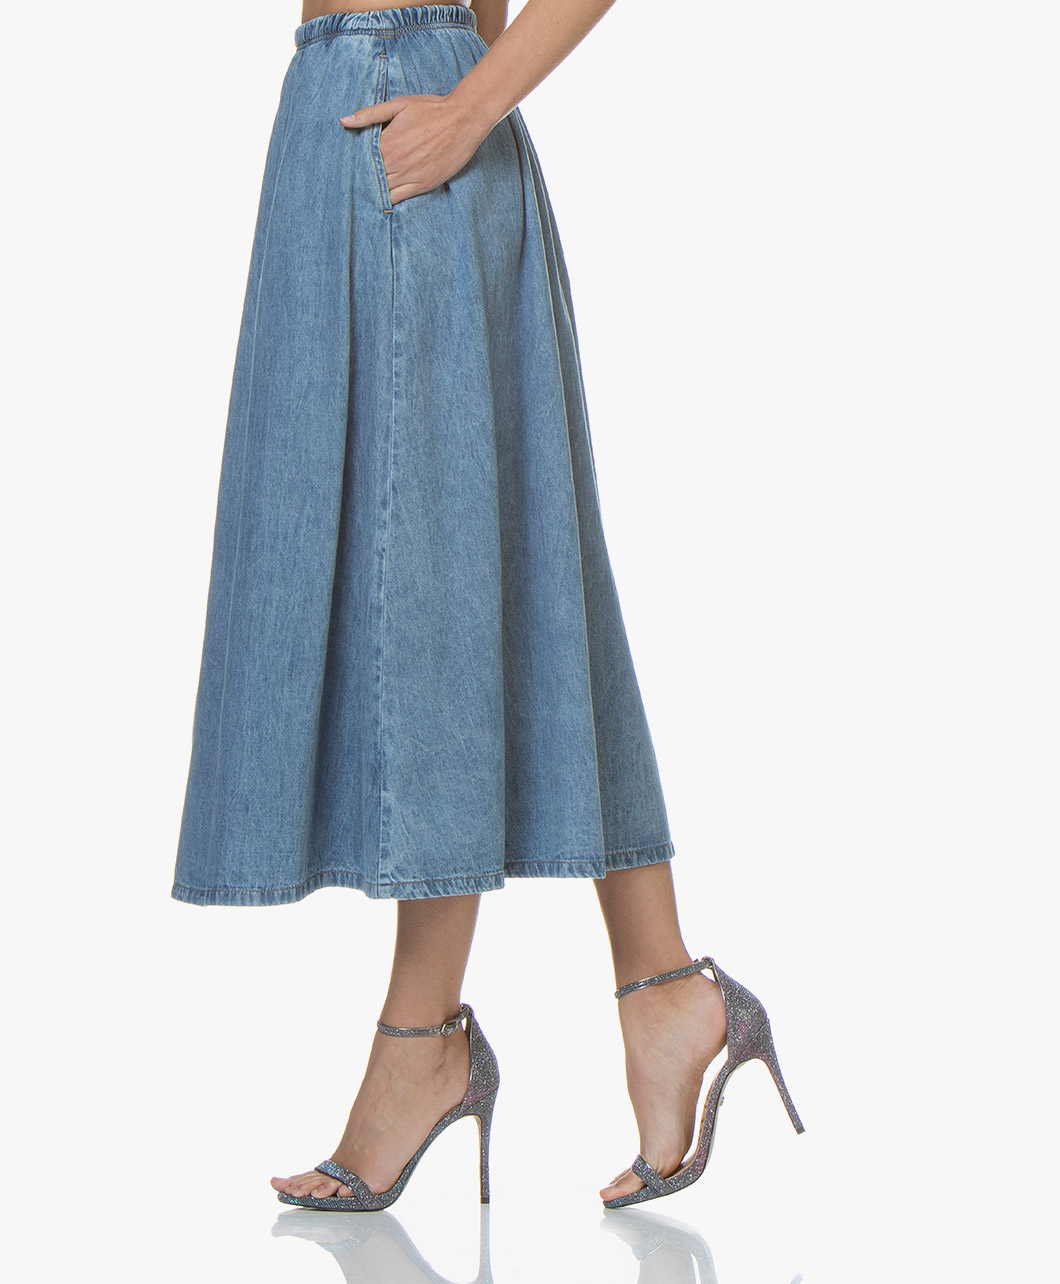 Skirt Blue Line Vintage Winiboo Denim A American jUSLMVpGqz